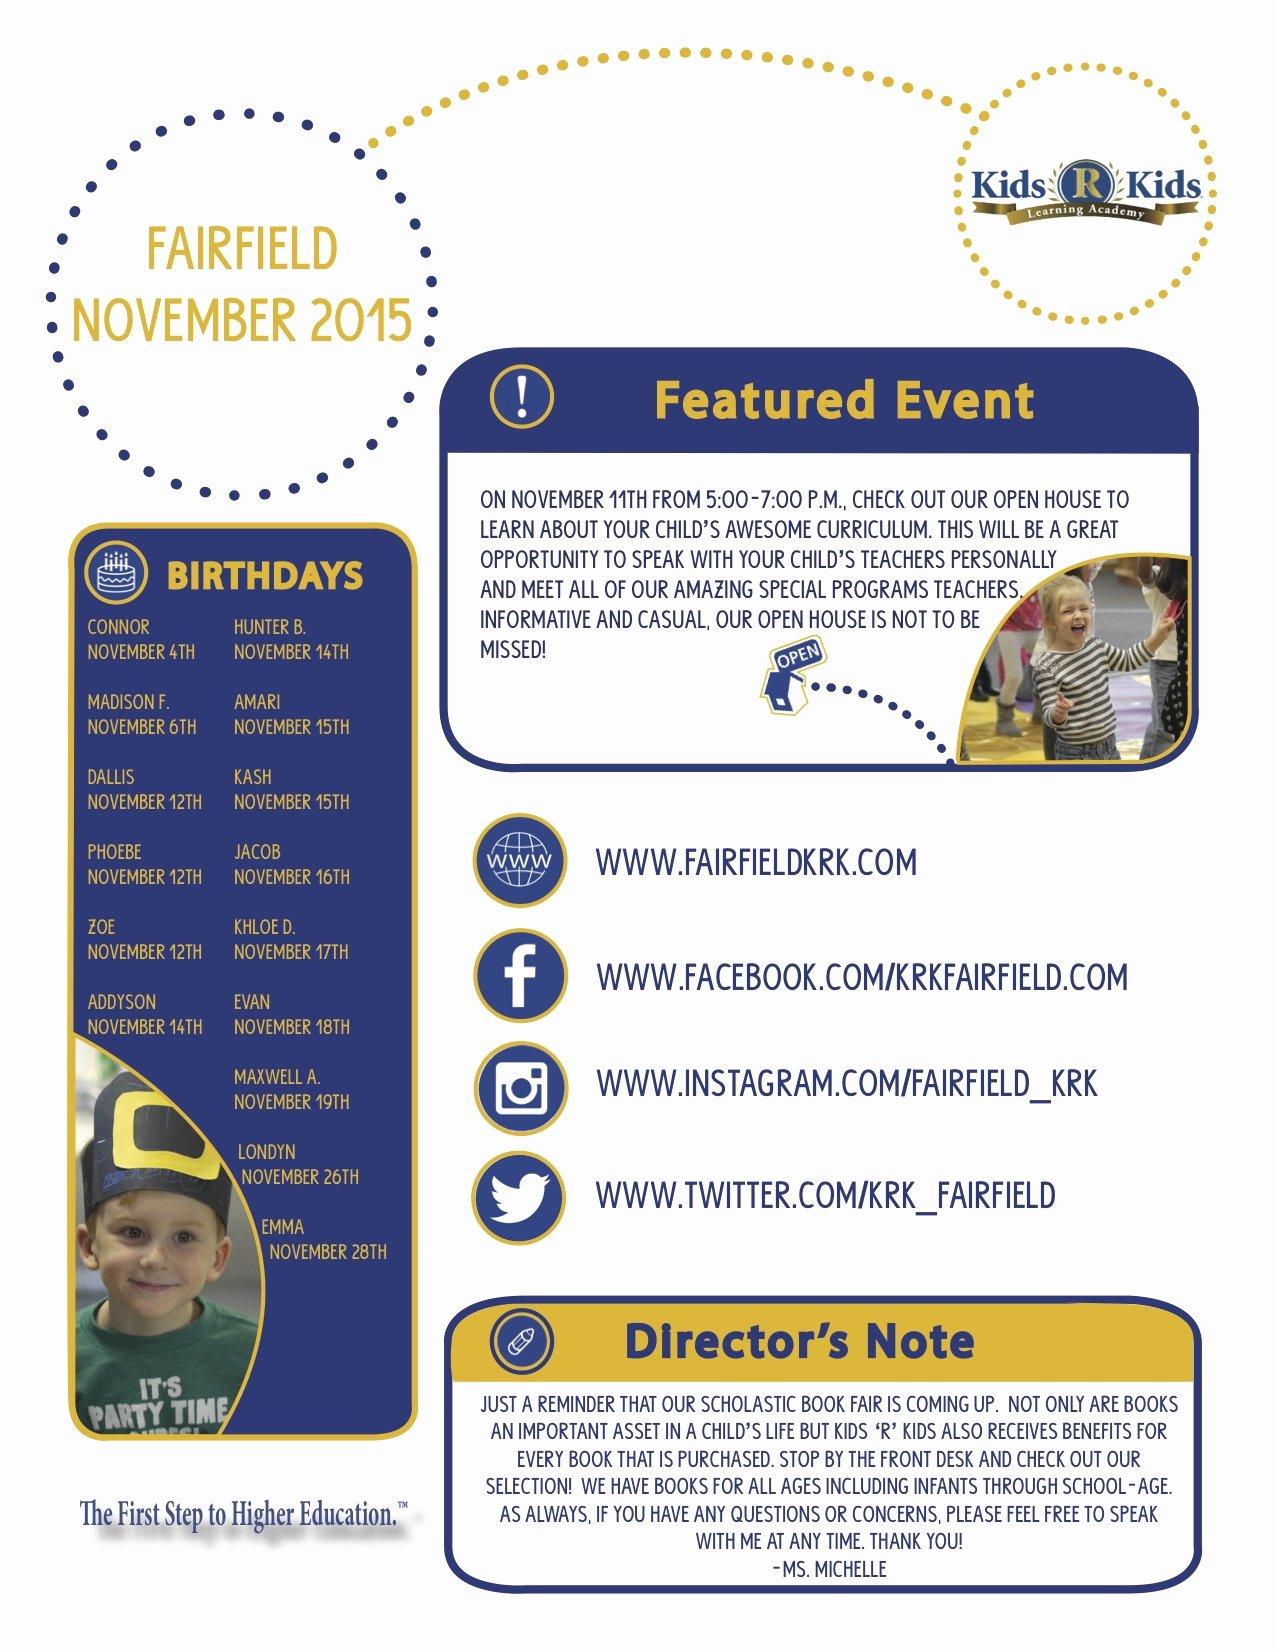 Newsletter Examples for Students Beautiful Sample Newsletter – Kids R Kids Greater Cincinnati